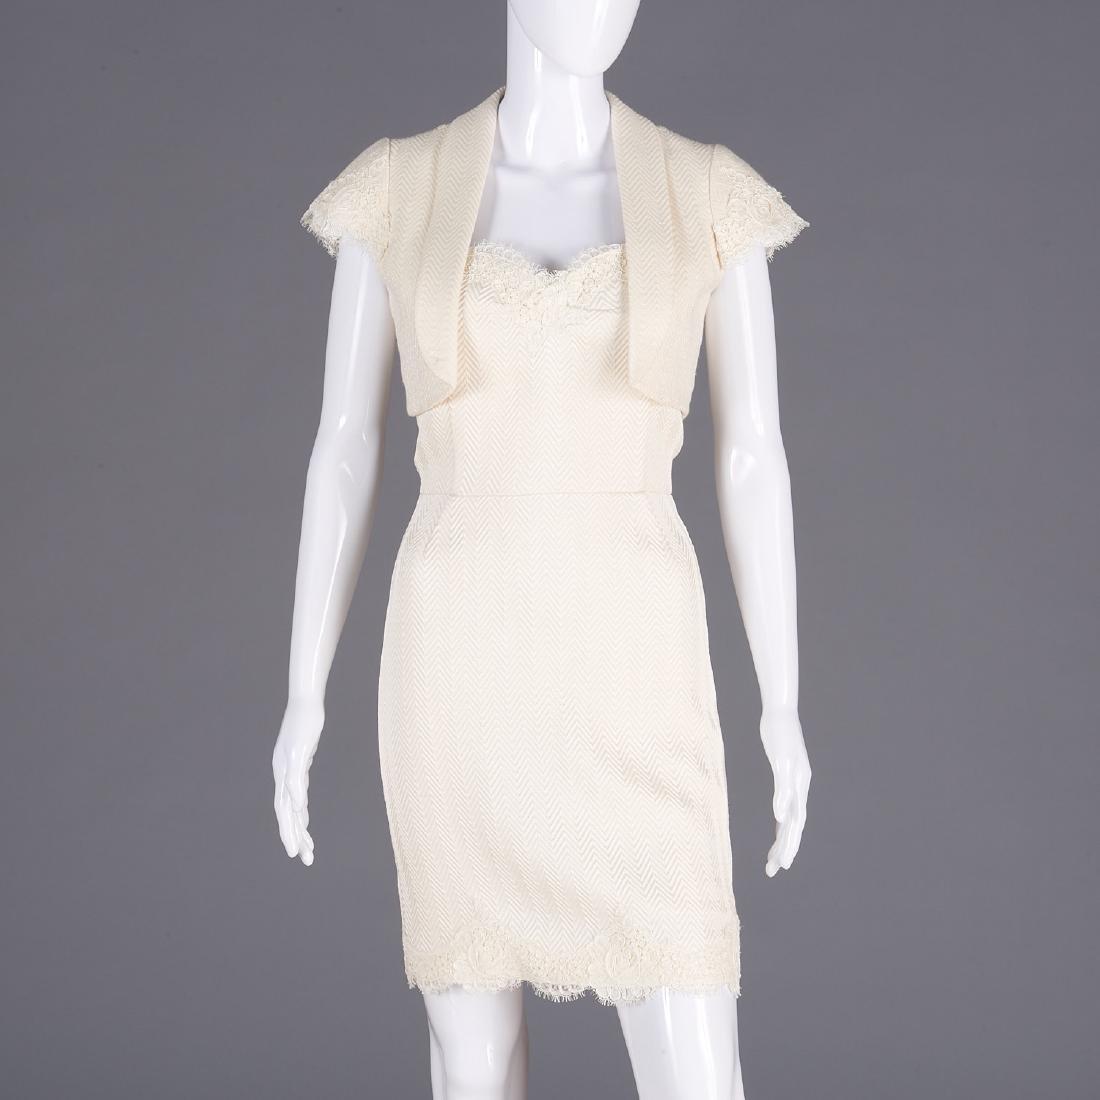 Cynthia Rose silk knit cocktail dress and shrug